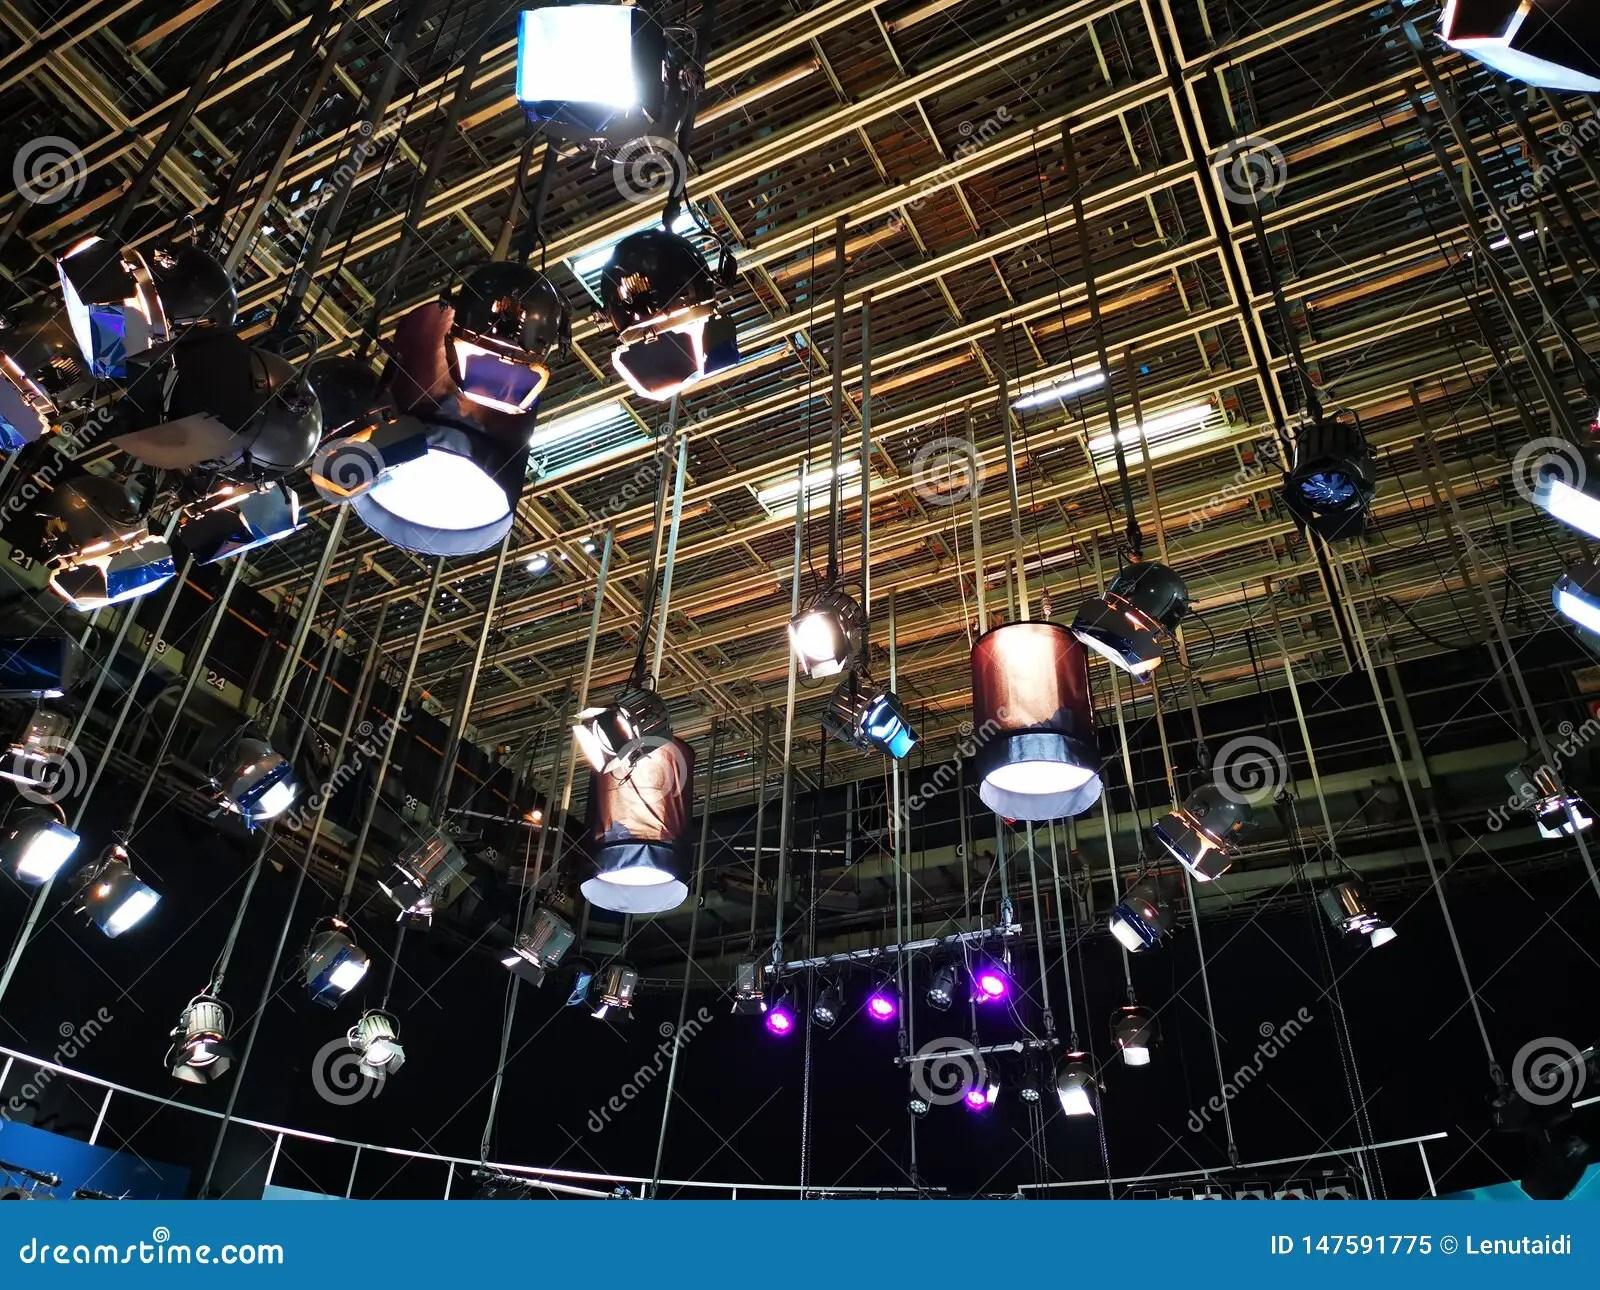 https www dreamstime com grid lights television studio professional lighting fixtures broadcasts image147591775